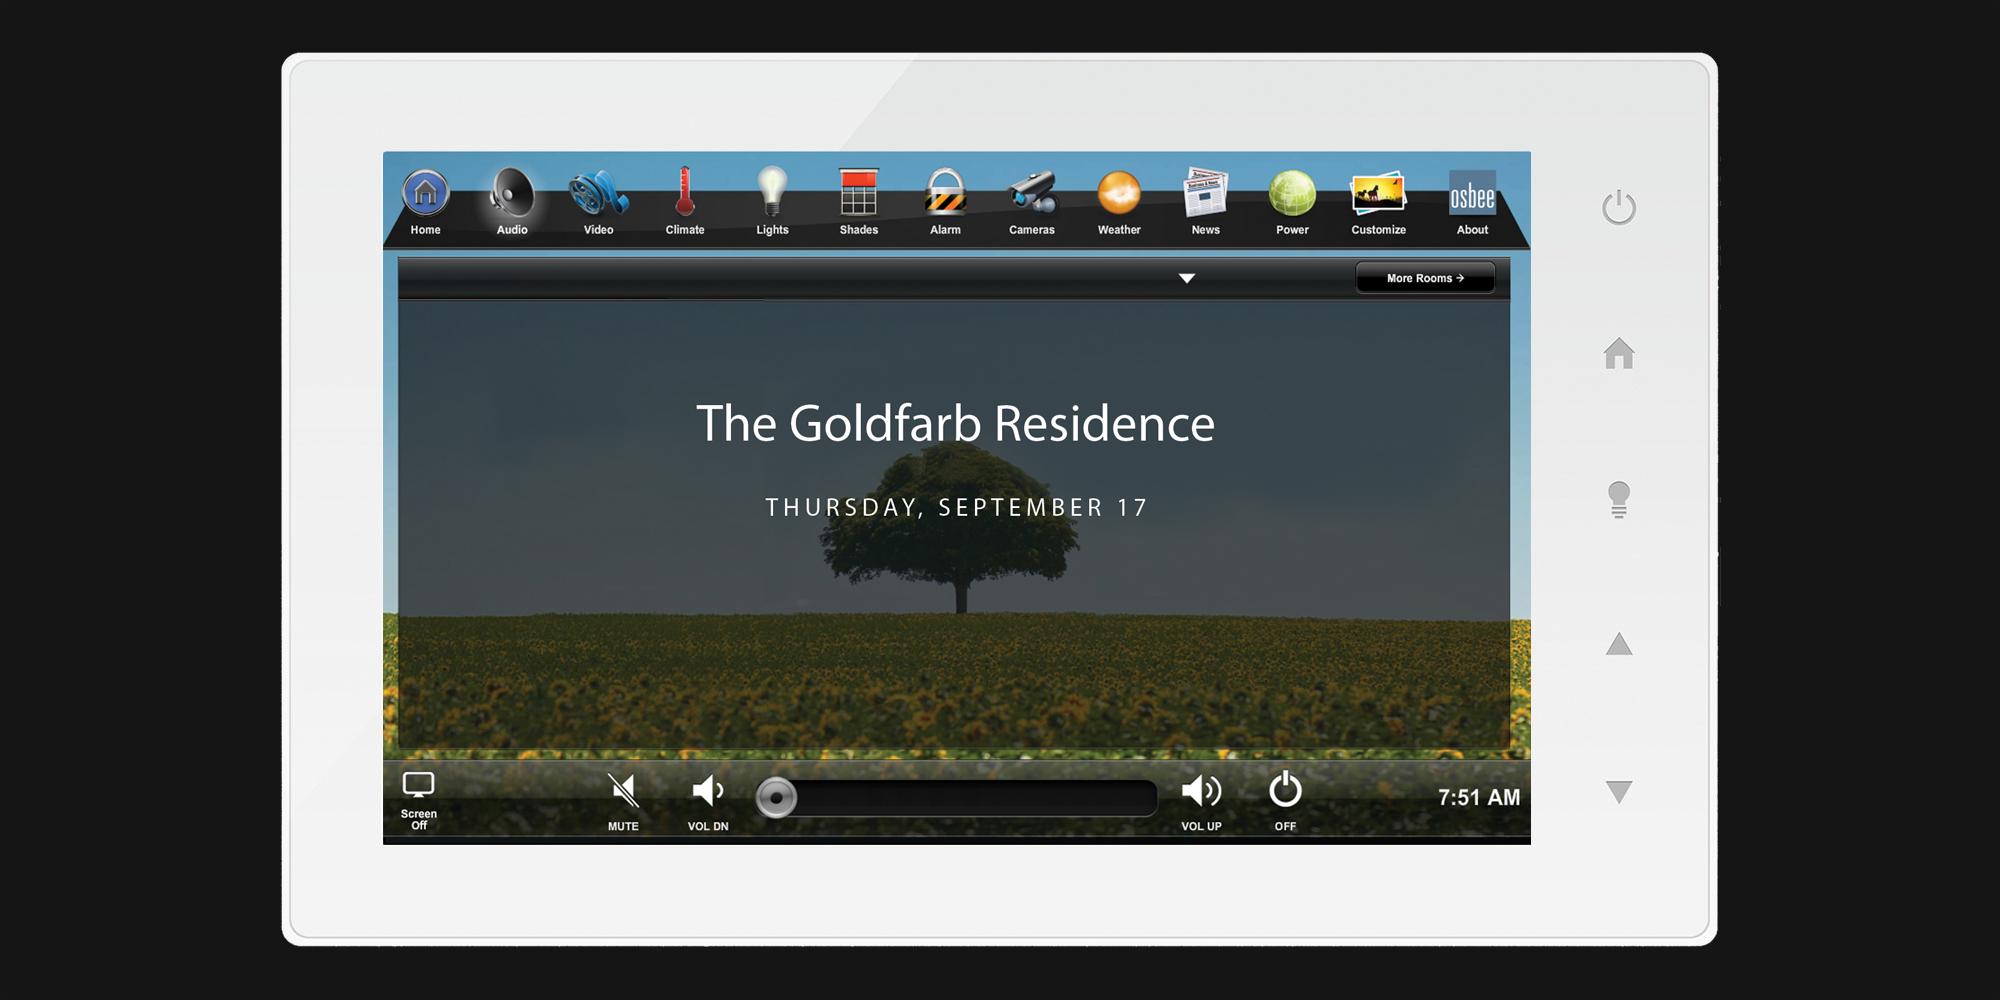 touchscreen, home screen